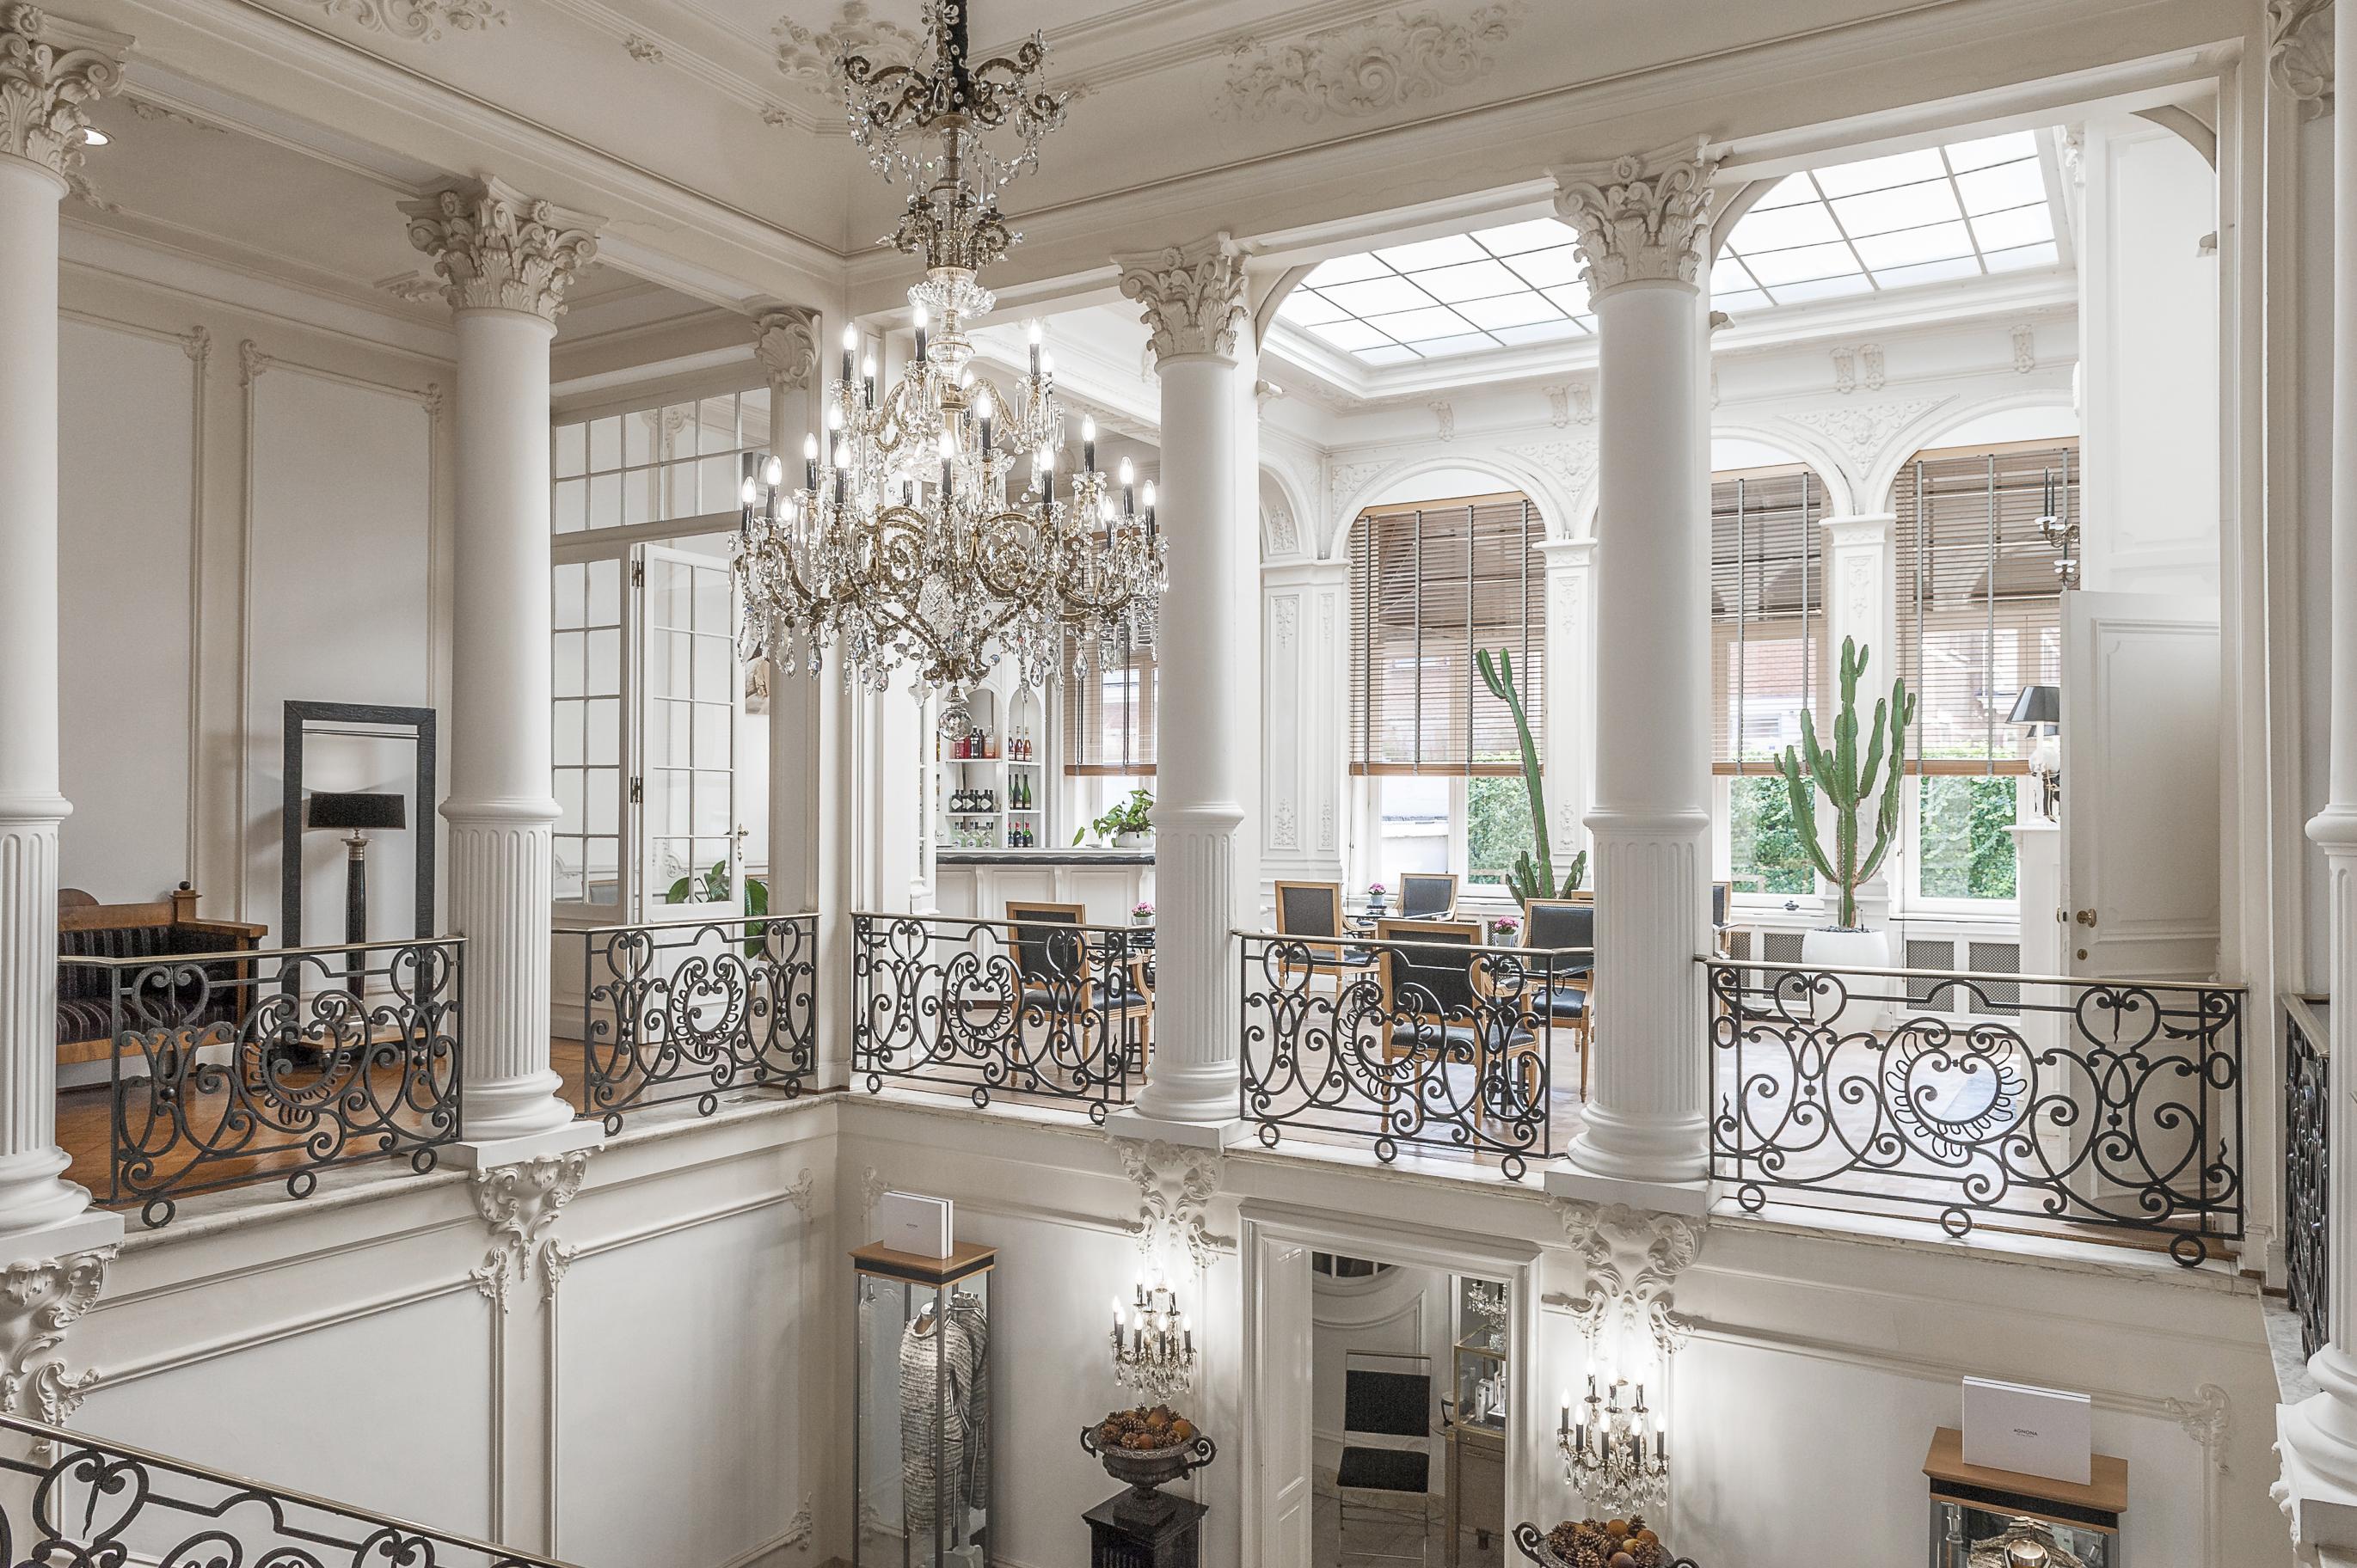 Histórica Mansão em Antuérpia / Engel & Völkers Antwerp Center